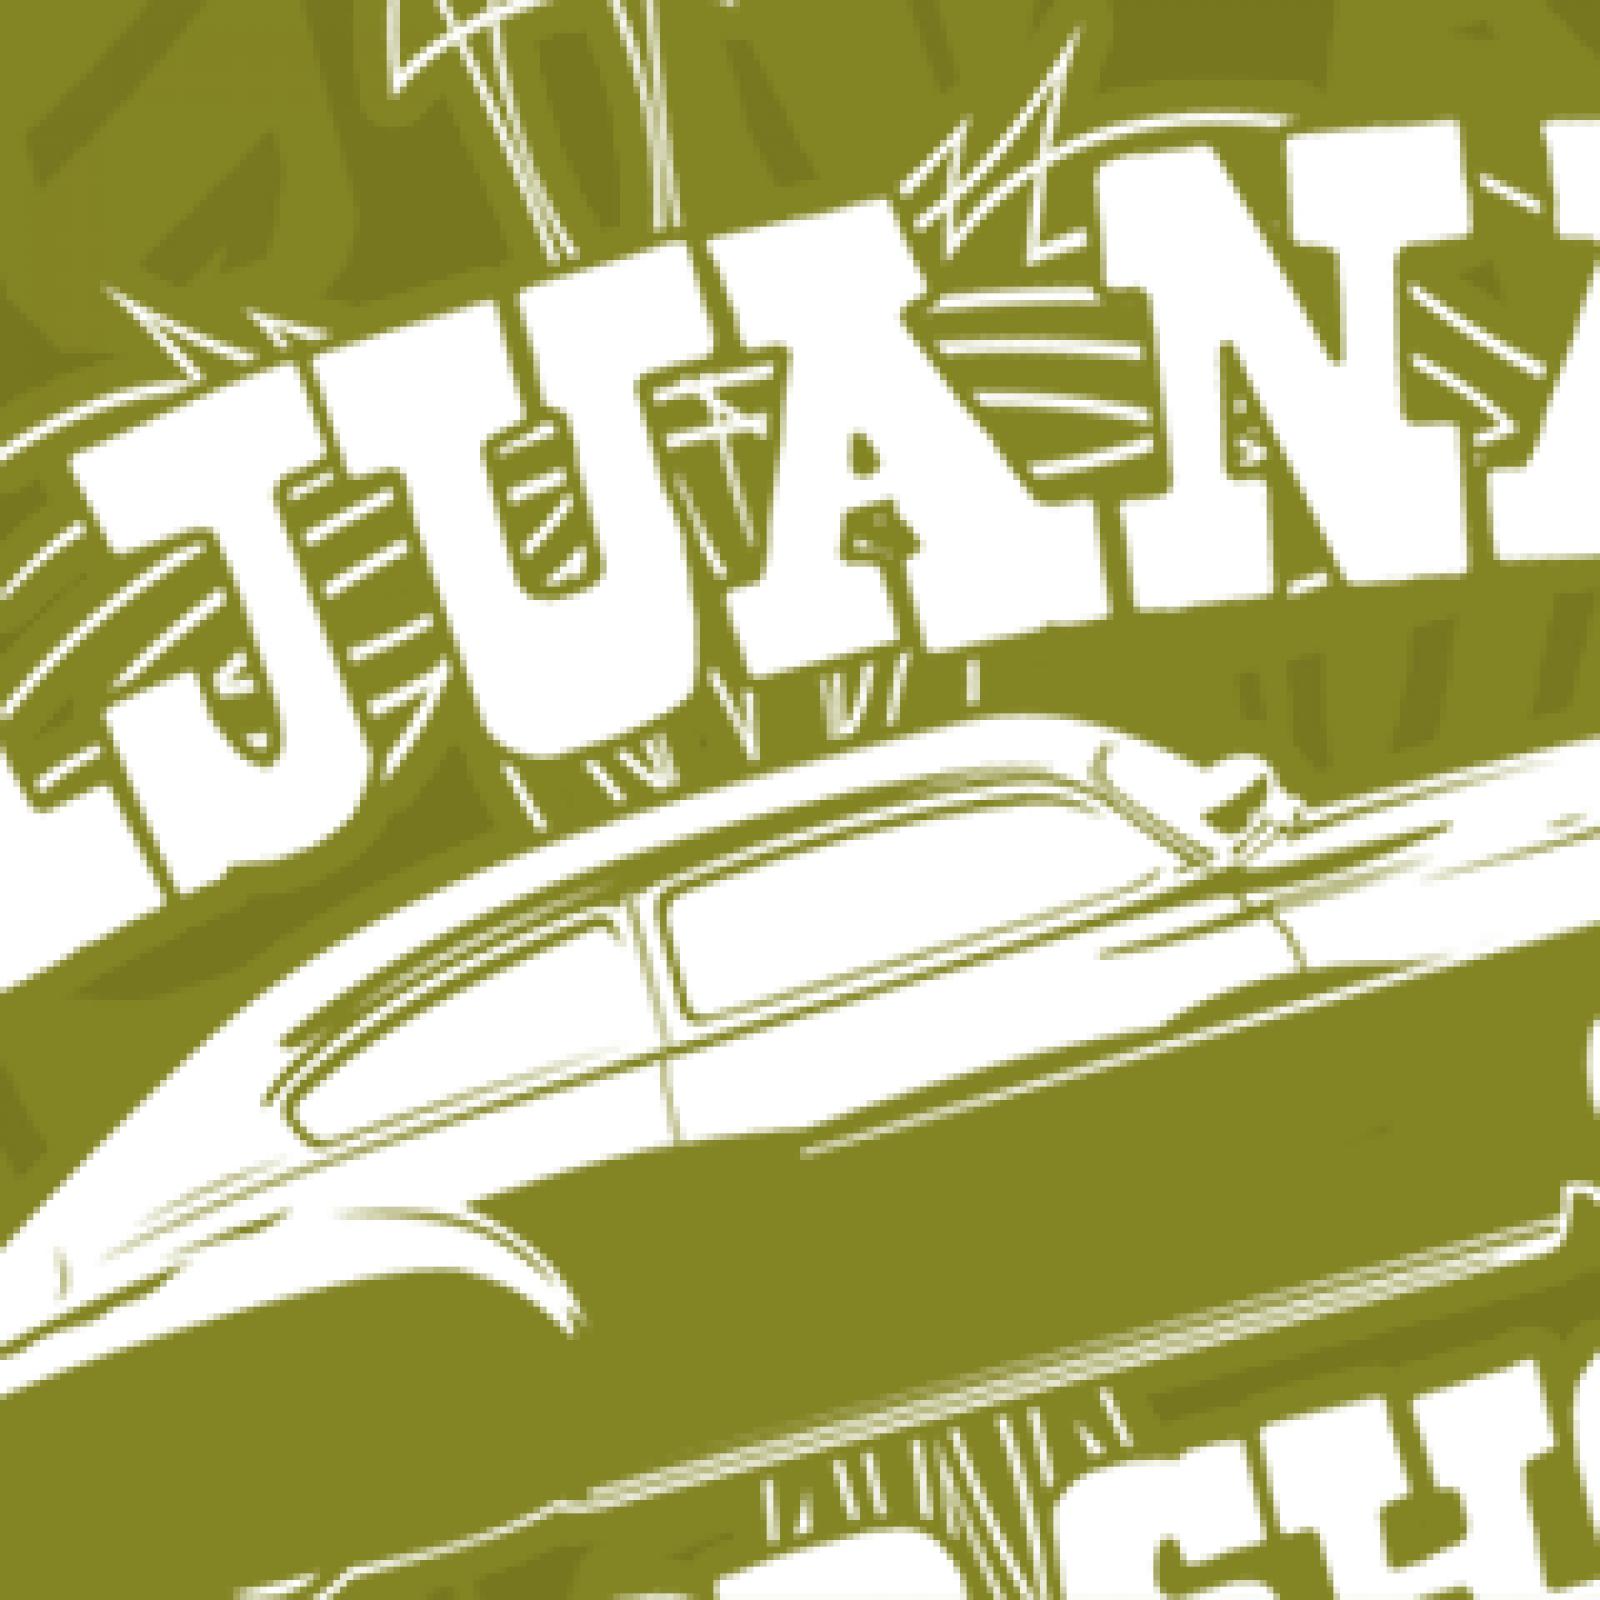 tijuana chop shop shirt print